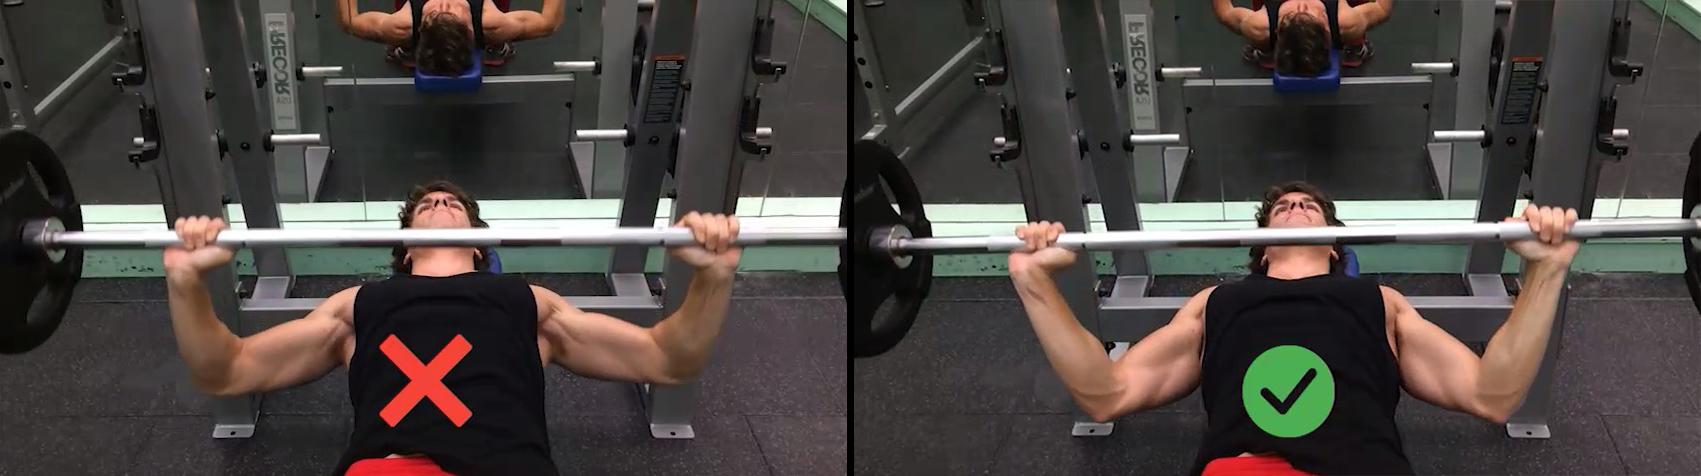 Programme pectoraux volume e programme musculation for Musculation volume